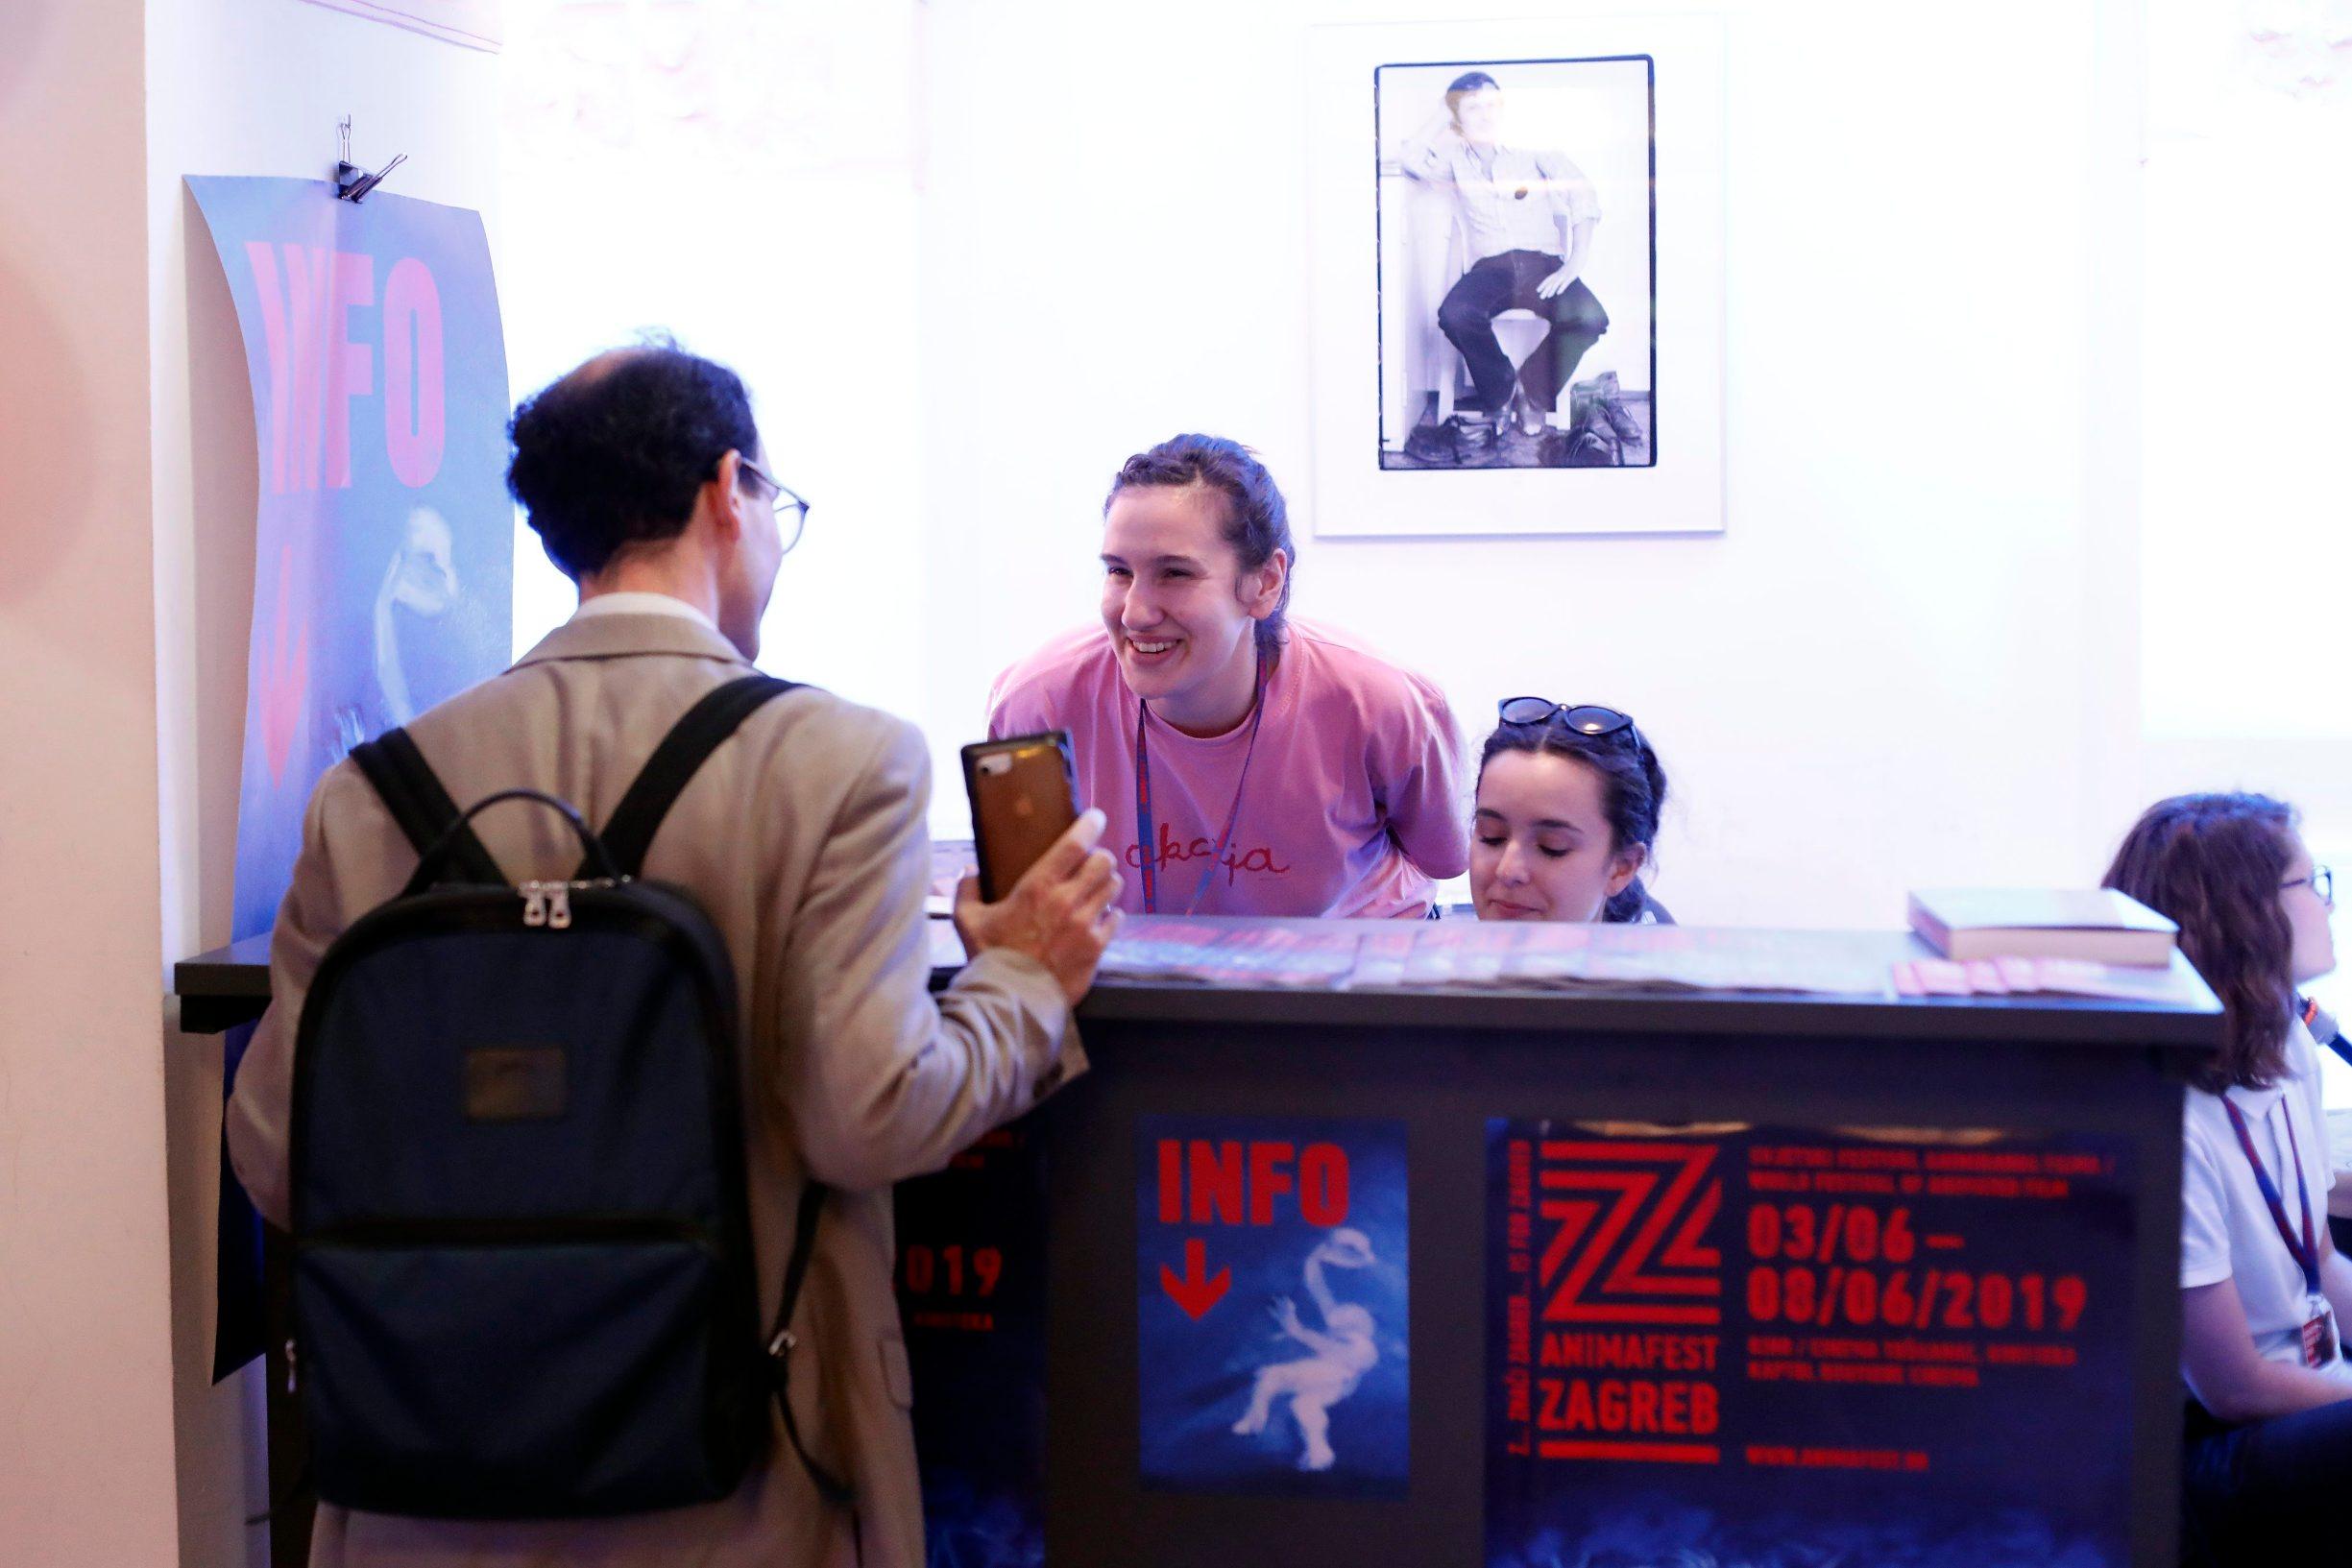 Zagreb, 030619. U kinu Tuskanac otvoren festival animiranog filma Animafest 2019. Na fotografiji: blagajna. Foto: Tomislav Kristo / CROPIX